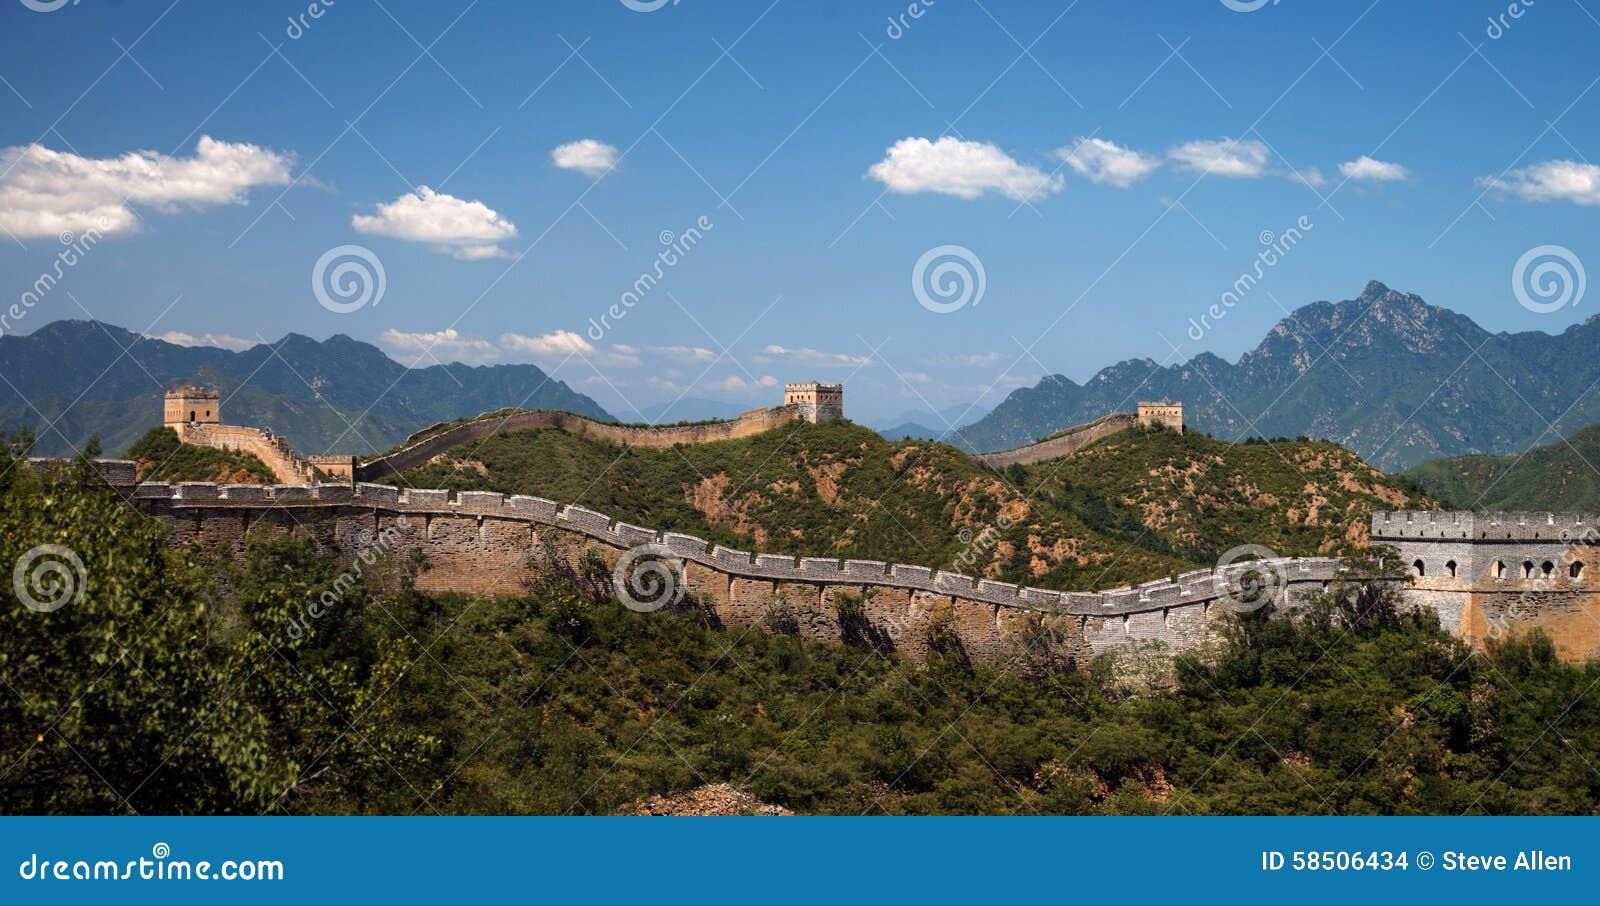 Grand Mur de la Chine - Jinshanling - la Chine